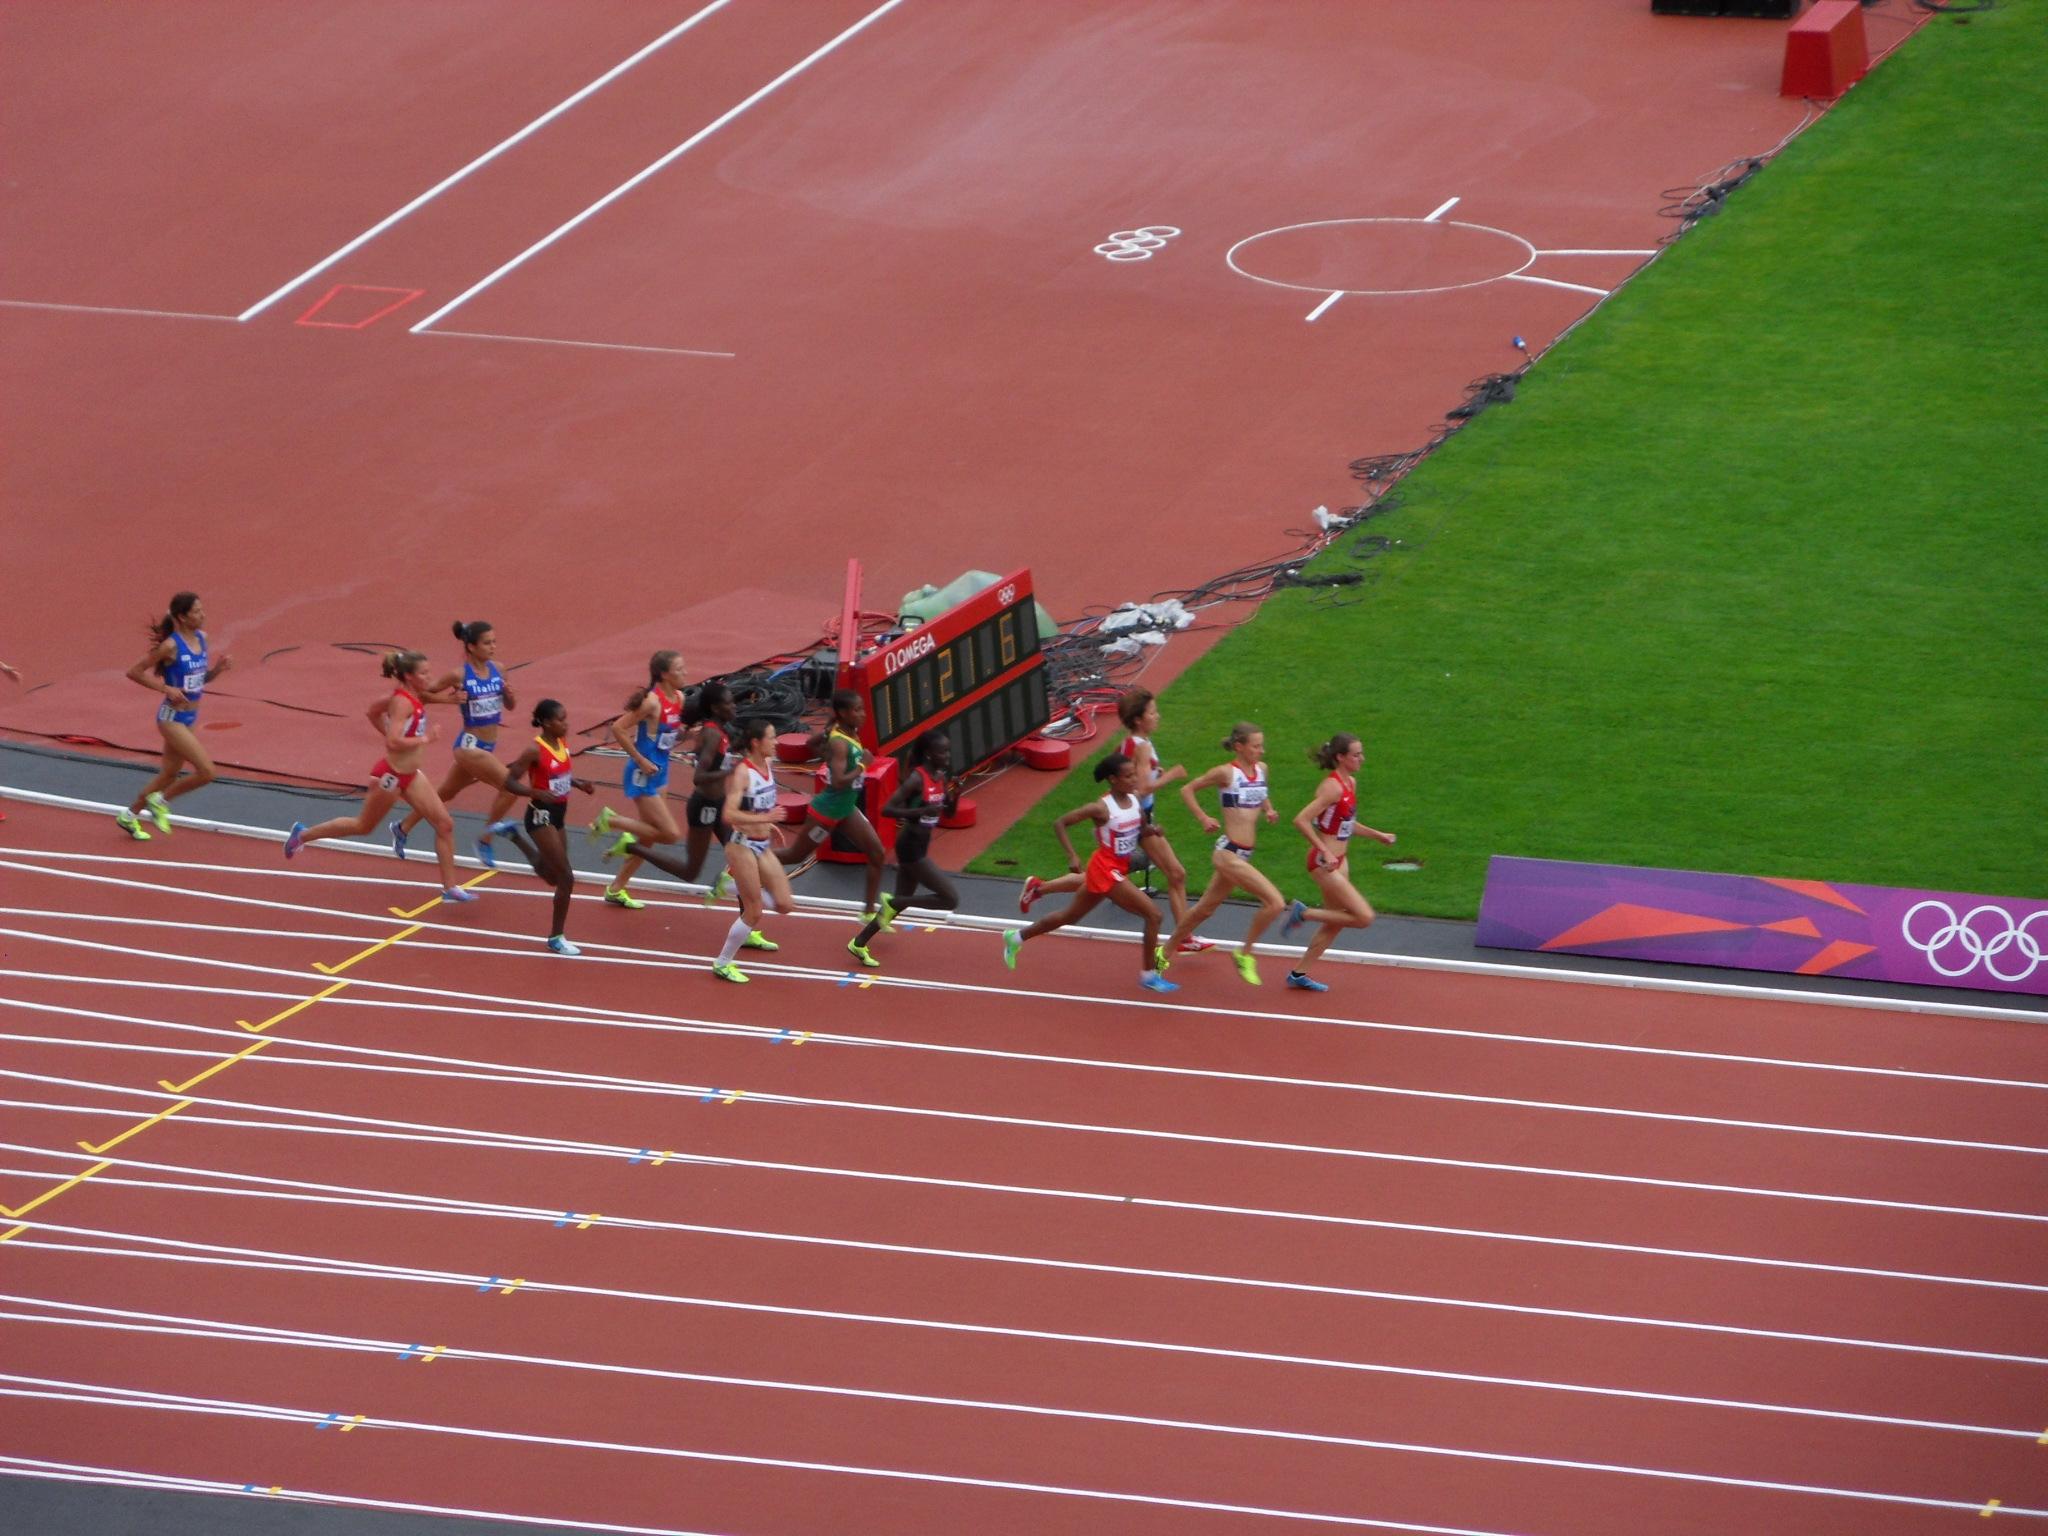 Olympic Park 20120807 013 W5K r1 h2